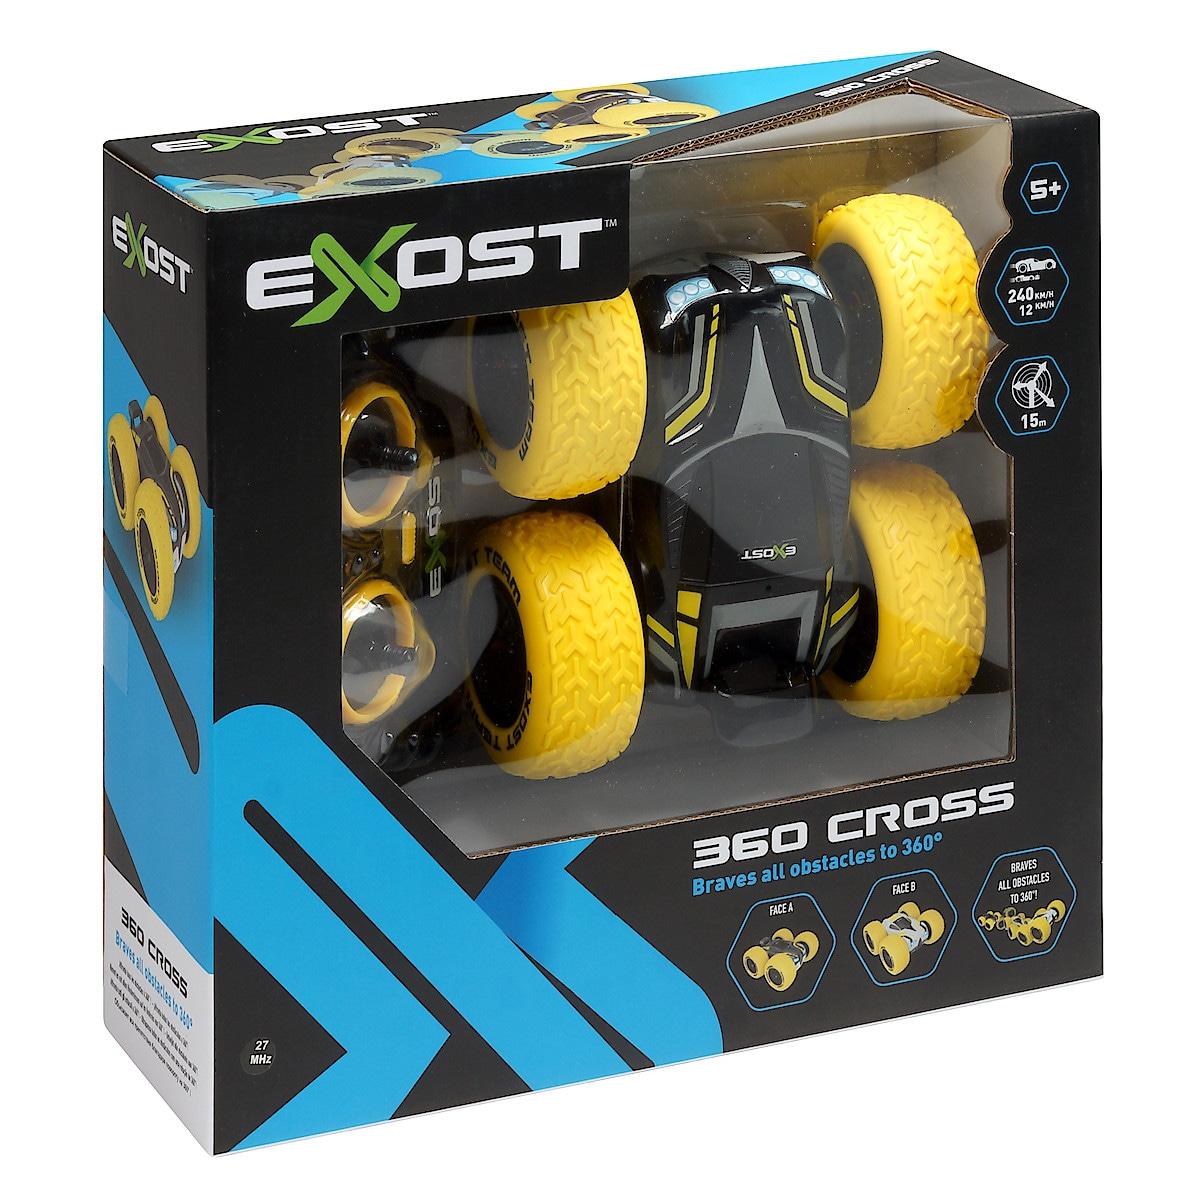 Radiostyrd stuntbil, Silverlit Exost 360 Cross